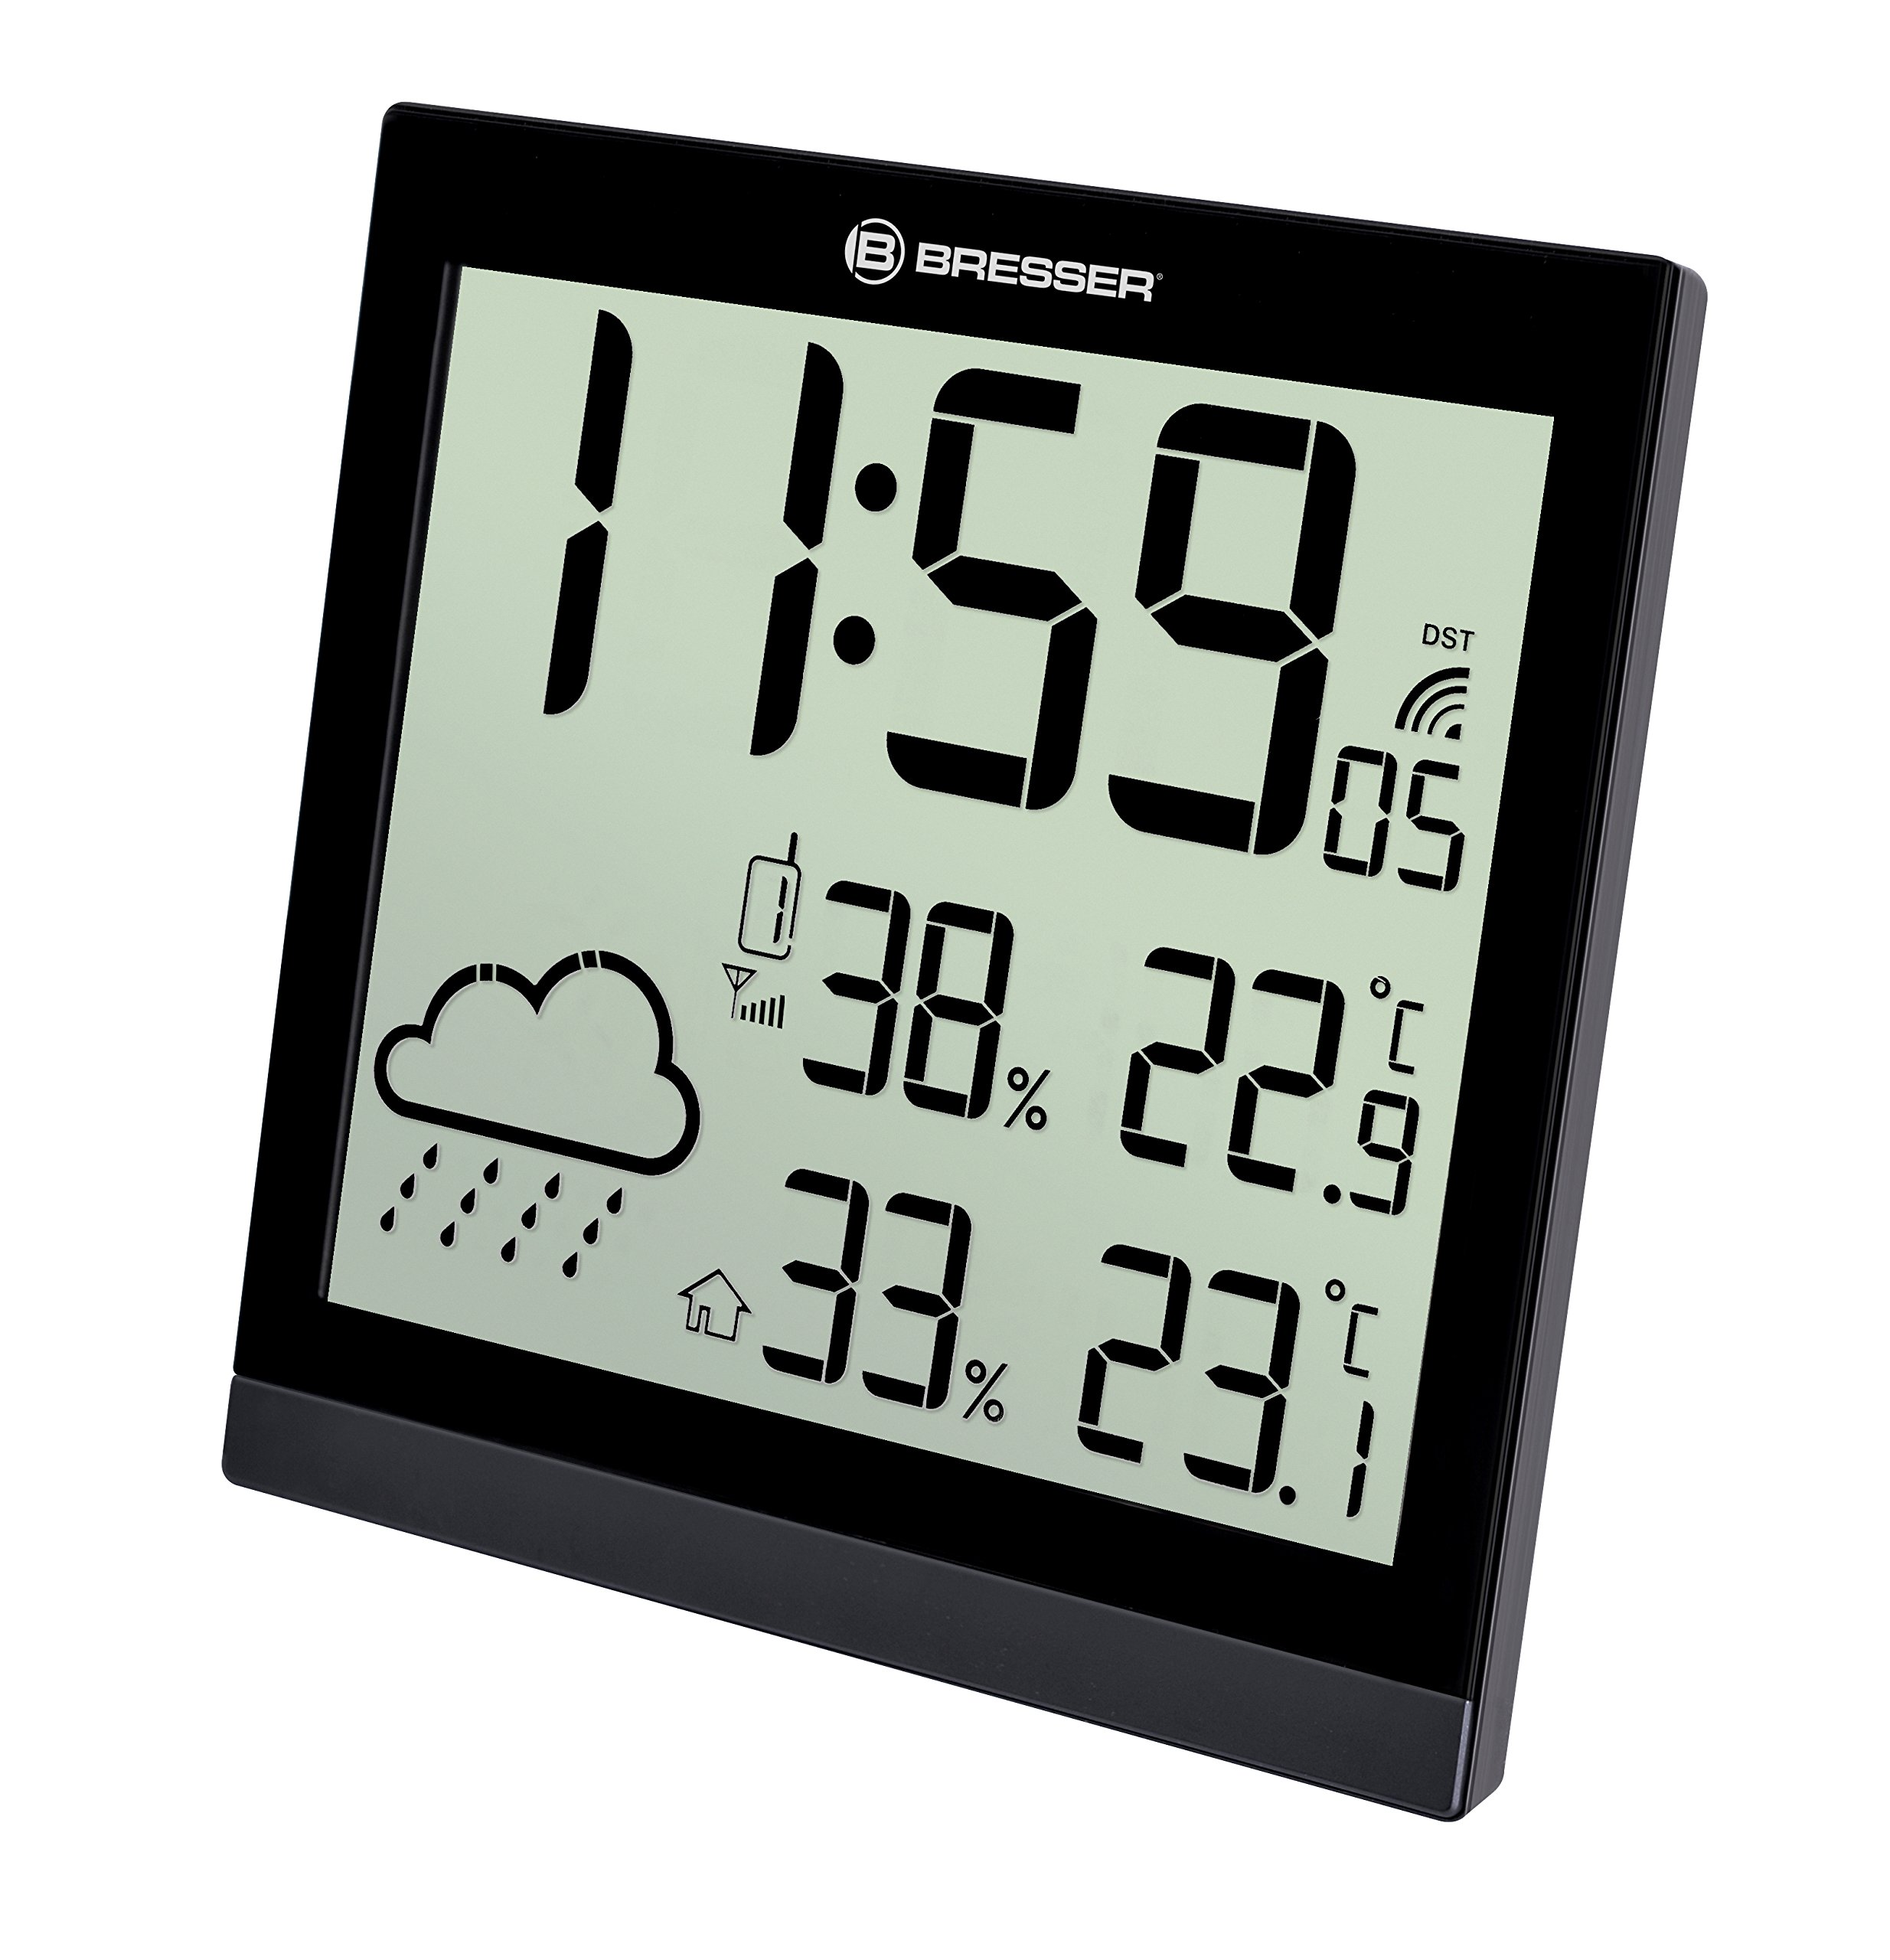 Bresser Weather Station Wall Clock Temeotrend Jc 22X22Cm With Outdoor Sensor, Black